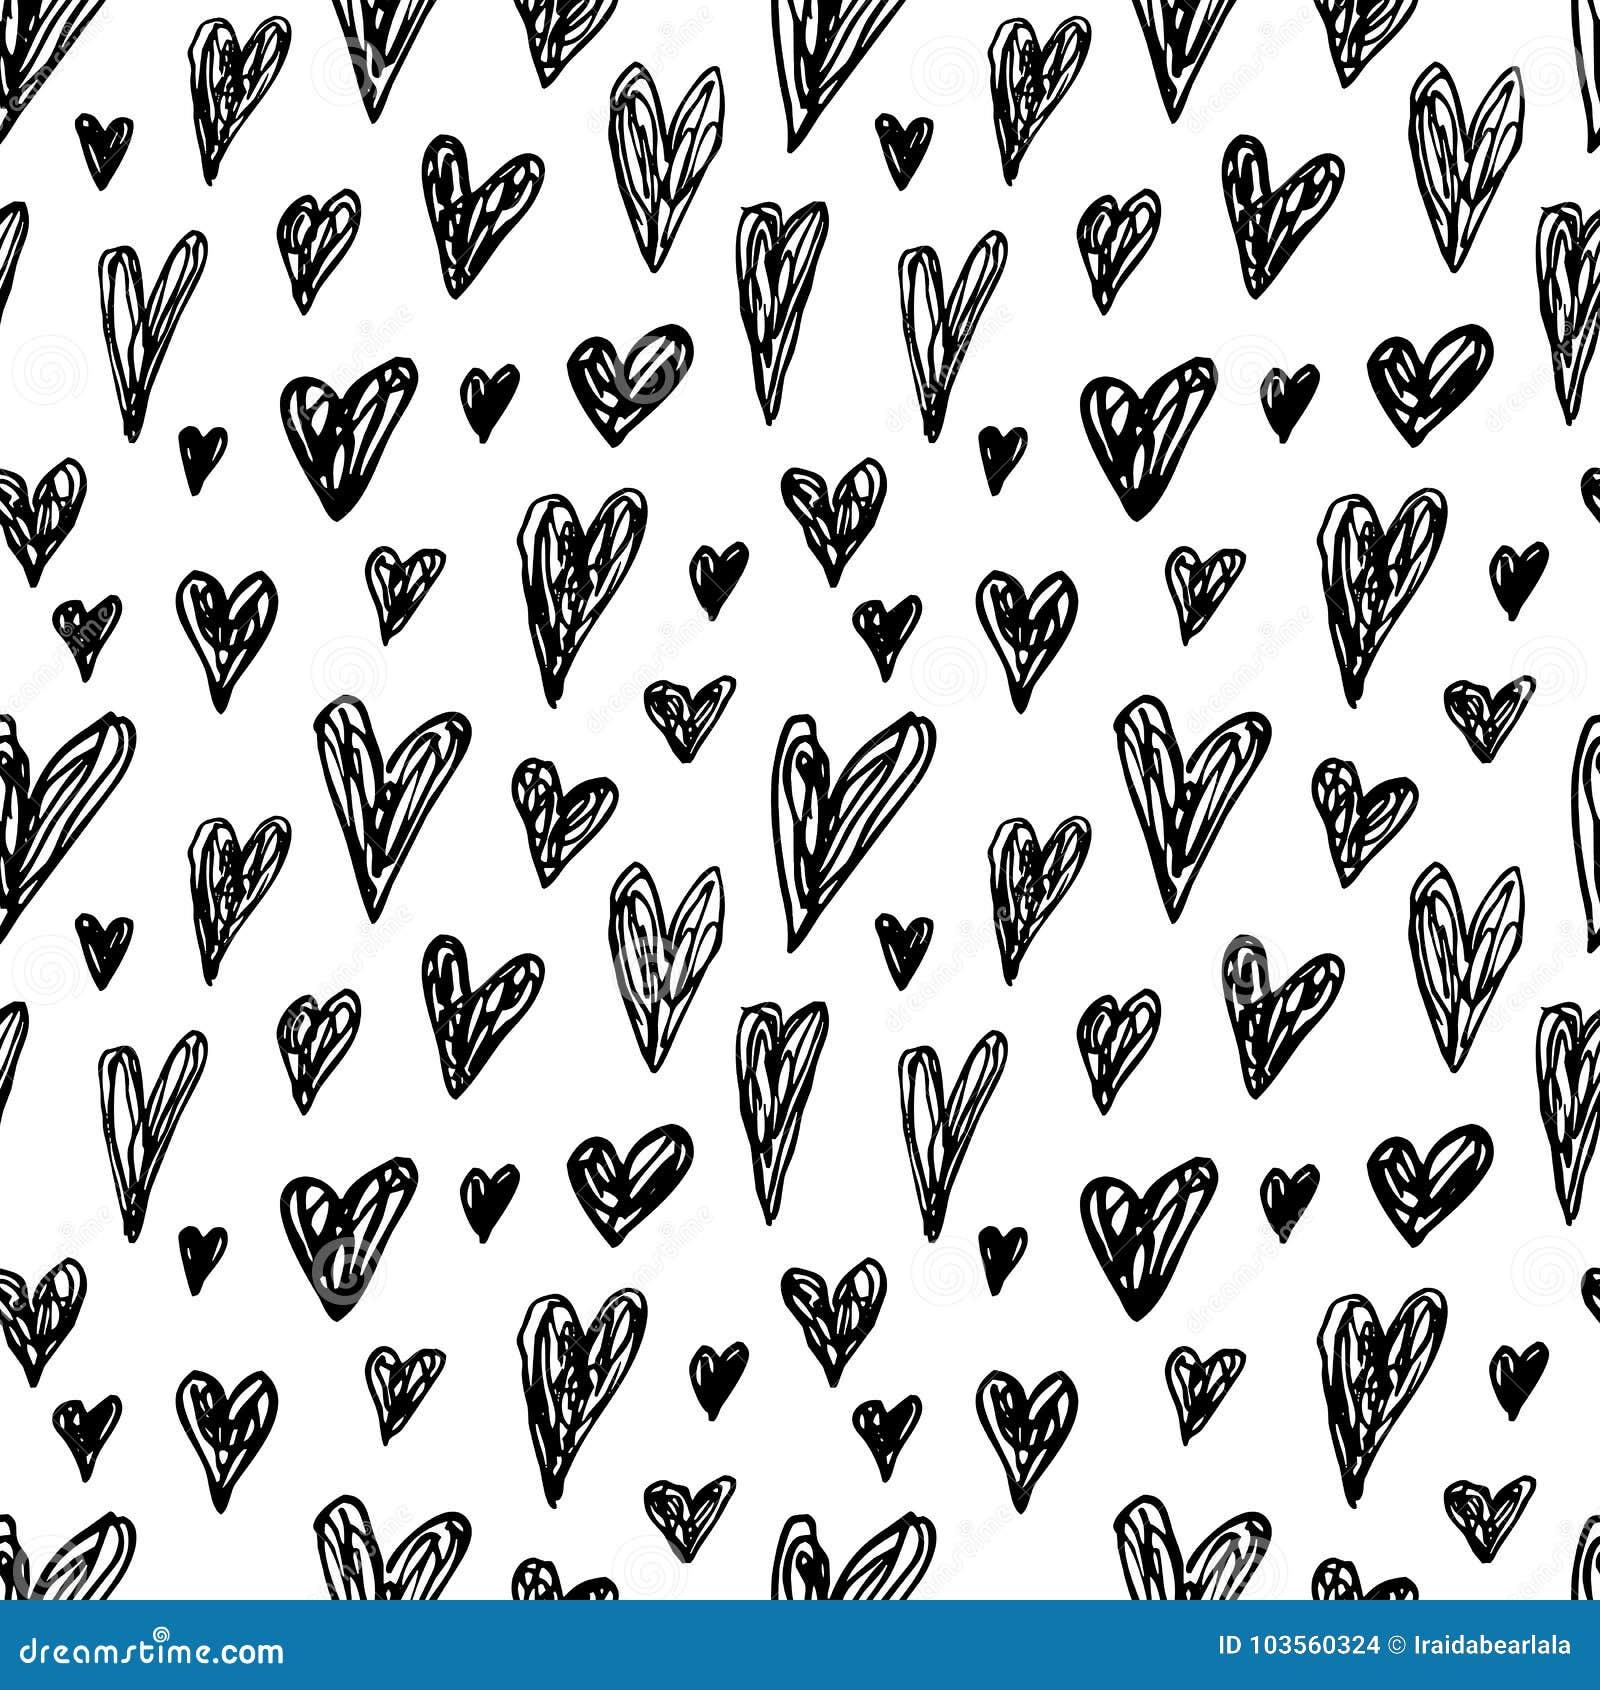 Creative Seamless pattern.